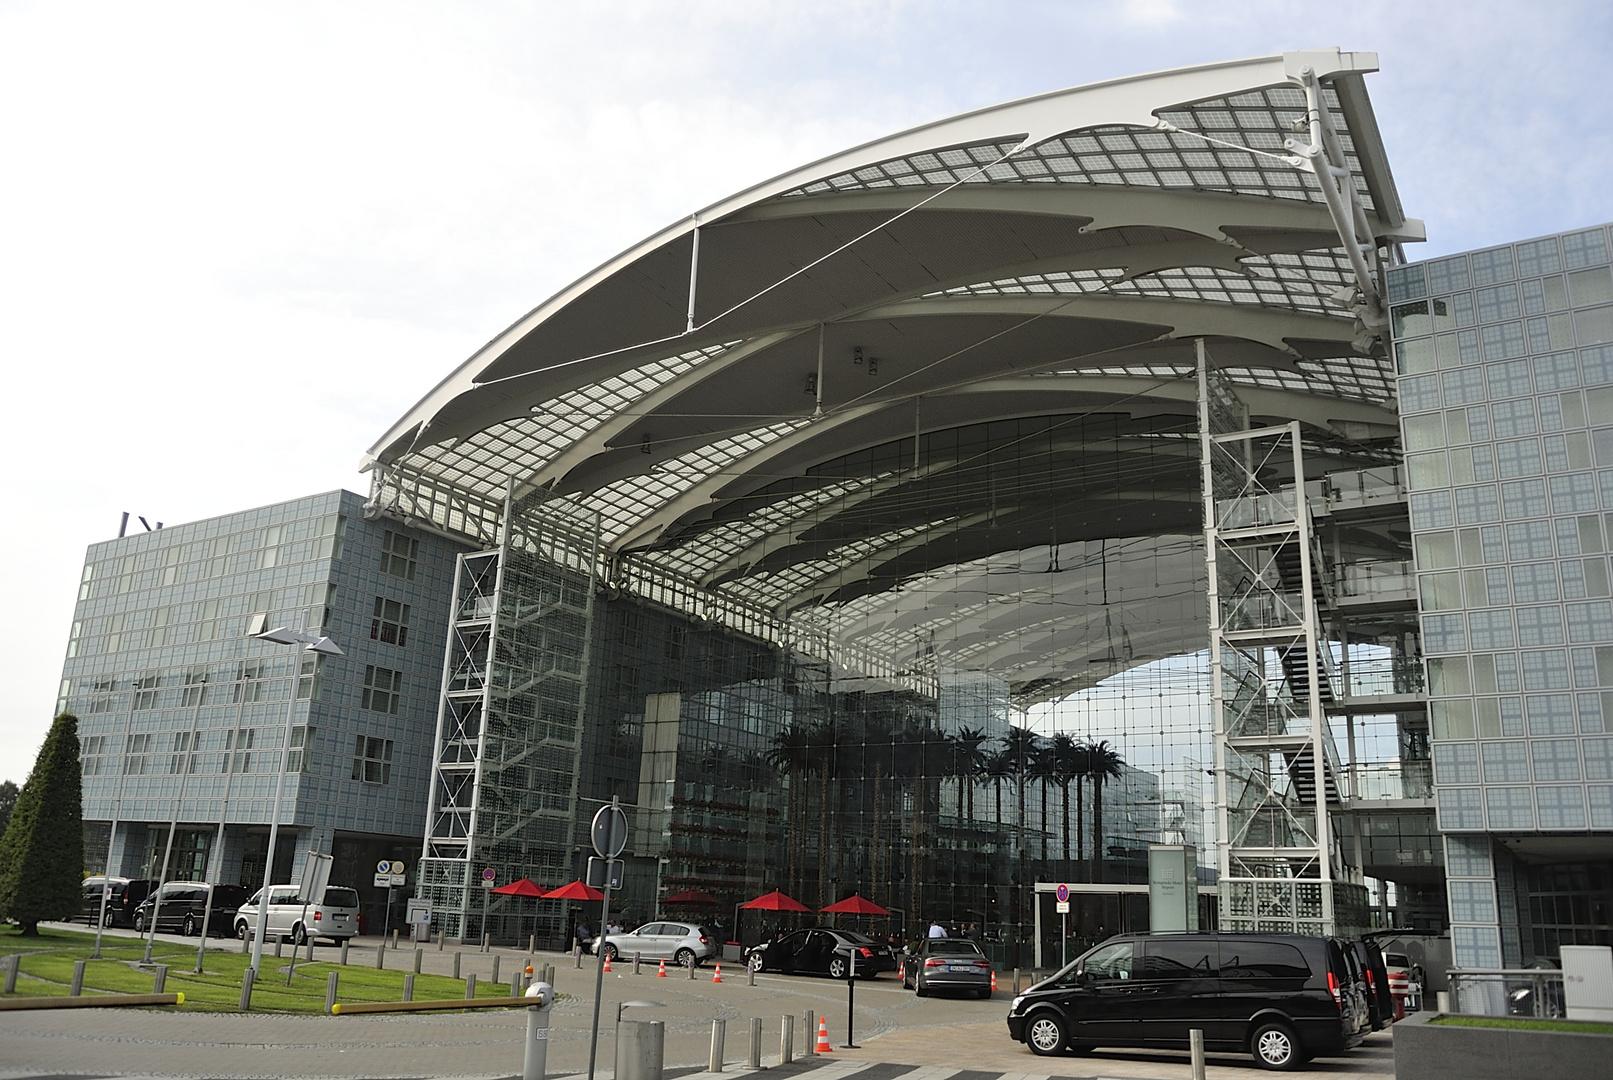 Flughafen München Hotel Kempinski